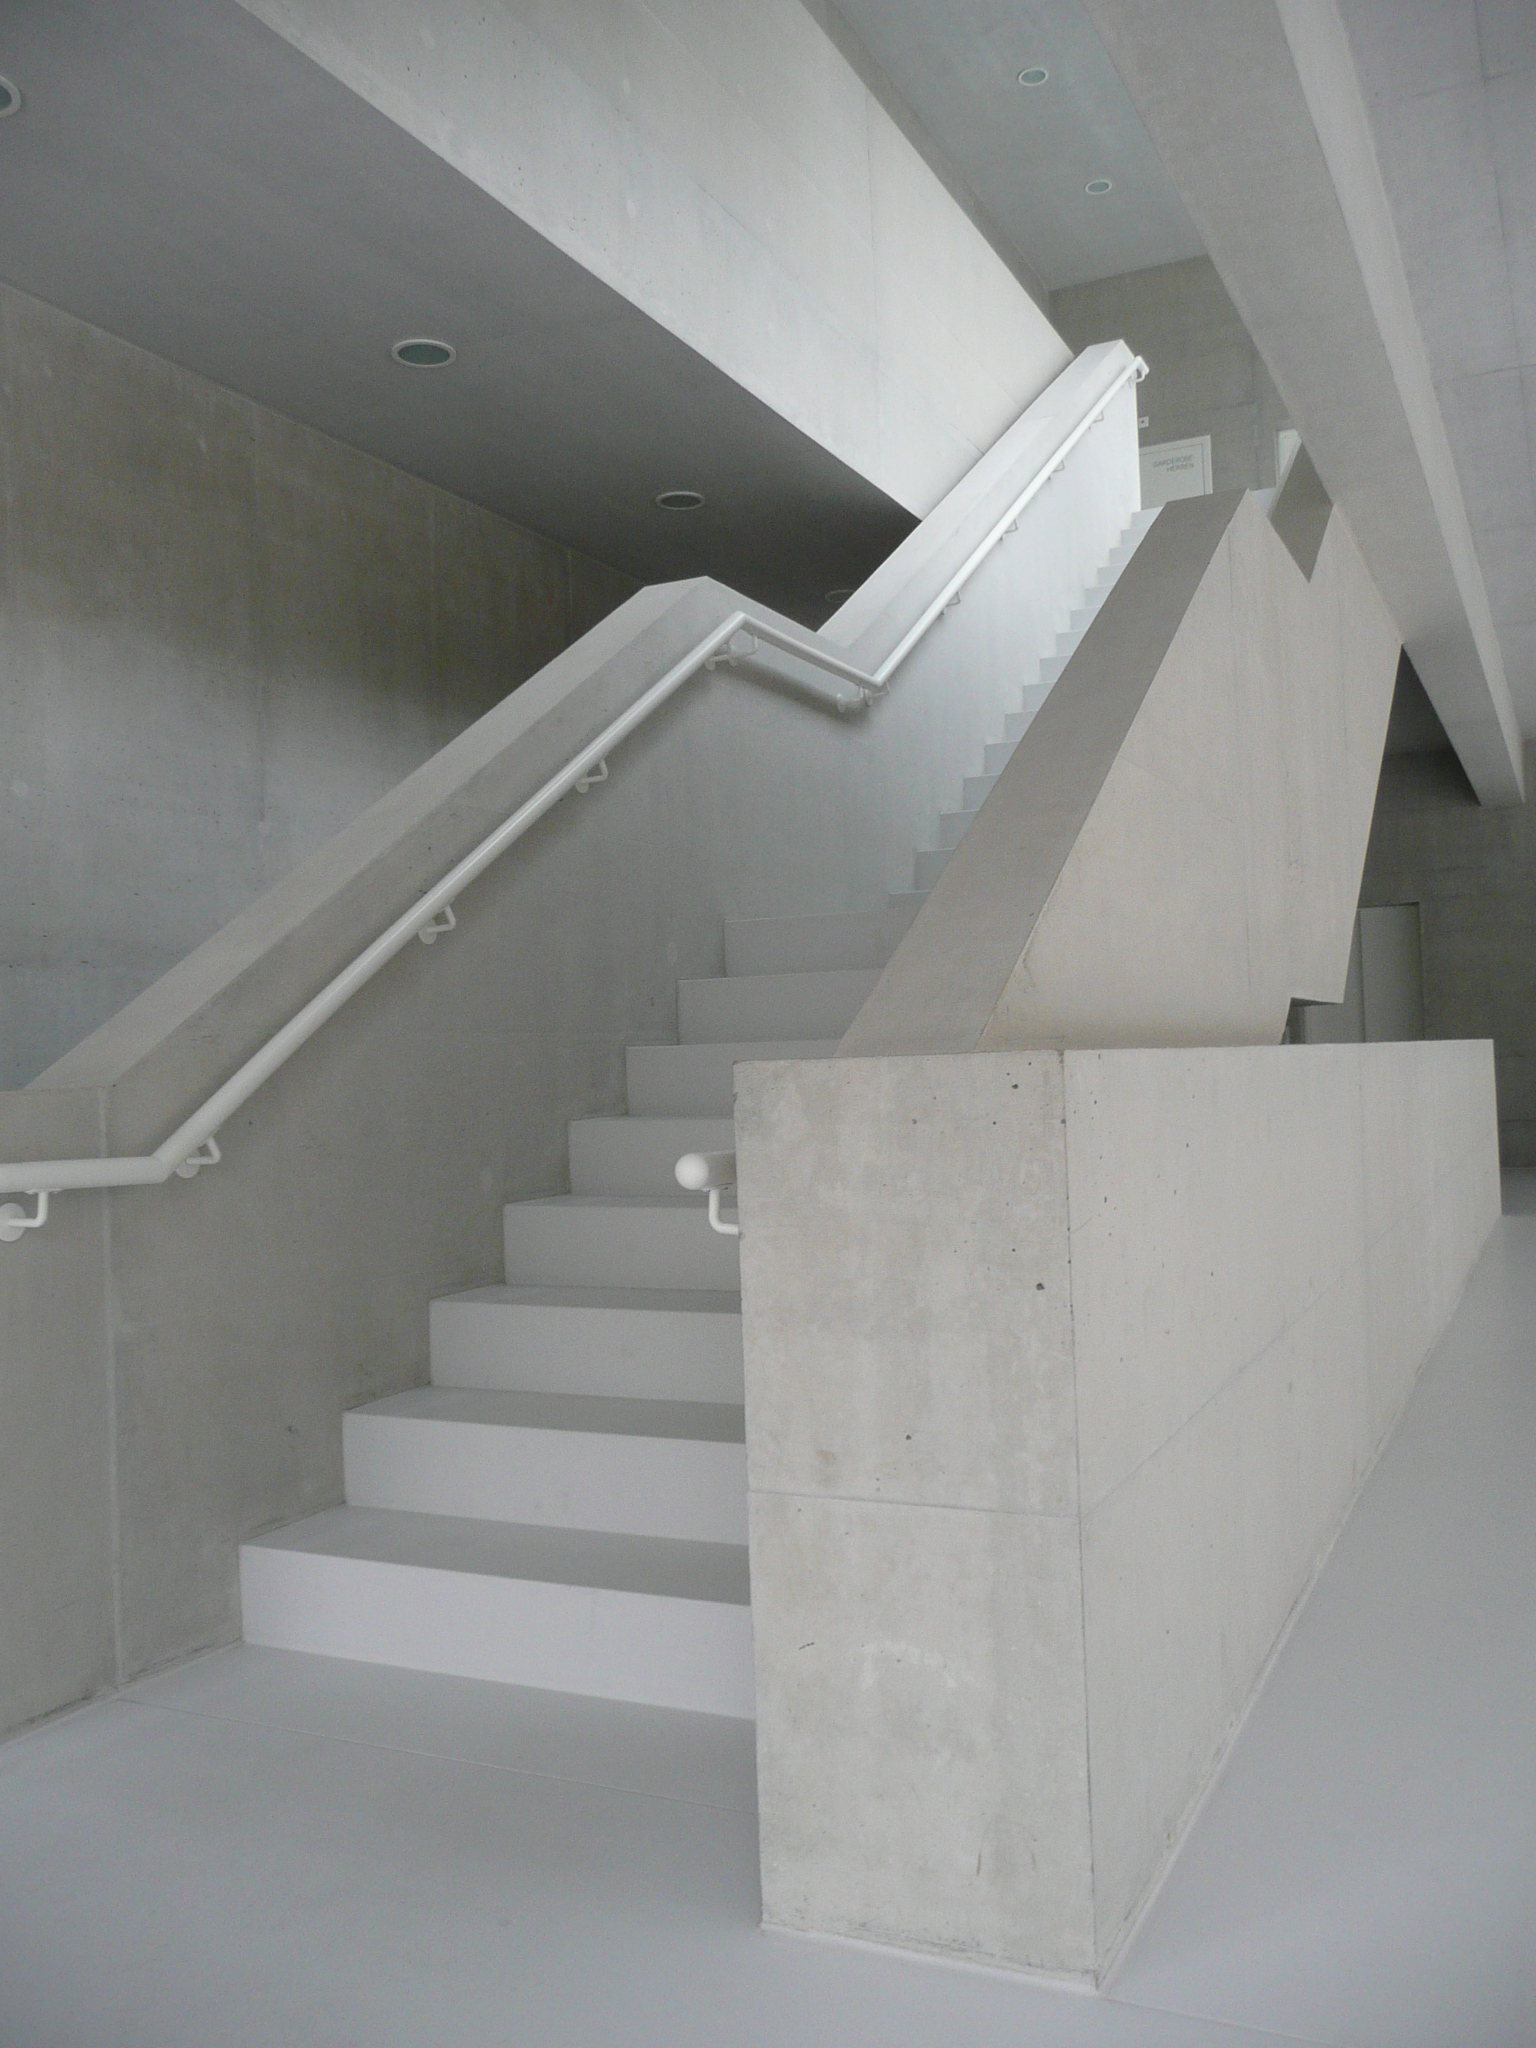 BEECK Concrete / Stone Glaze Project - Gym in Liestal Switzerland